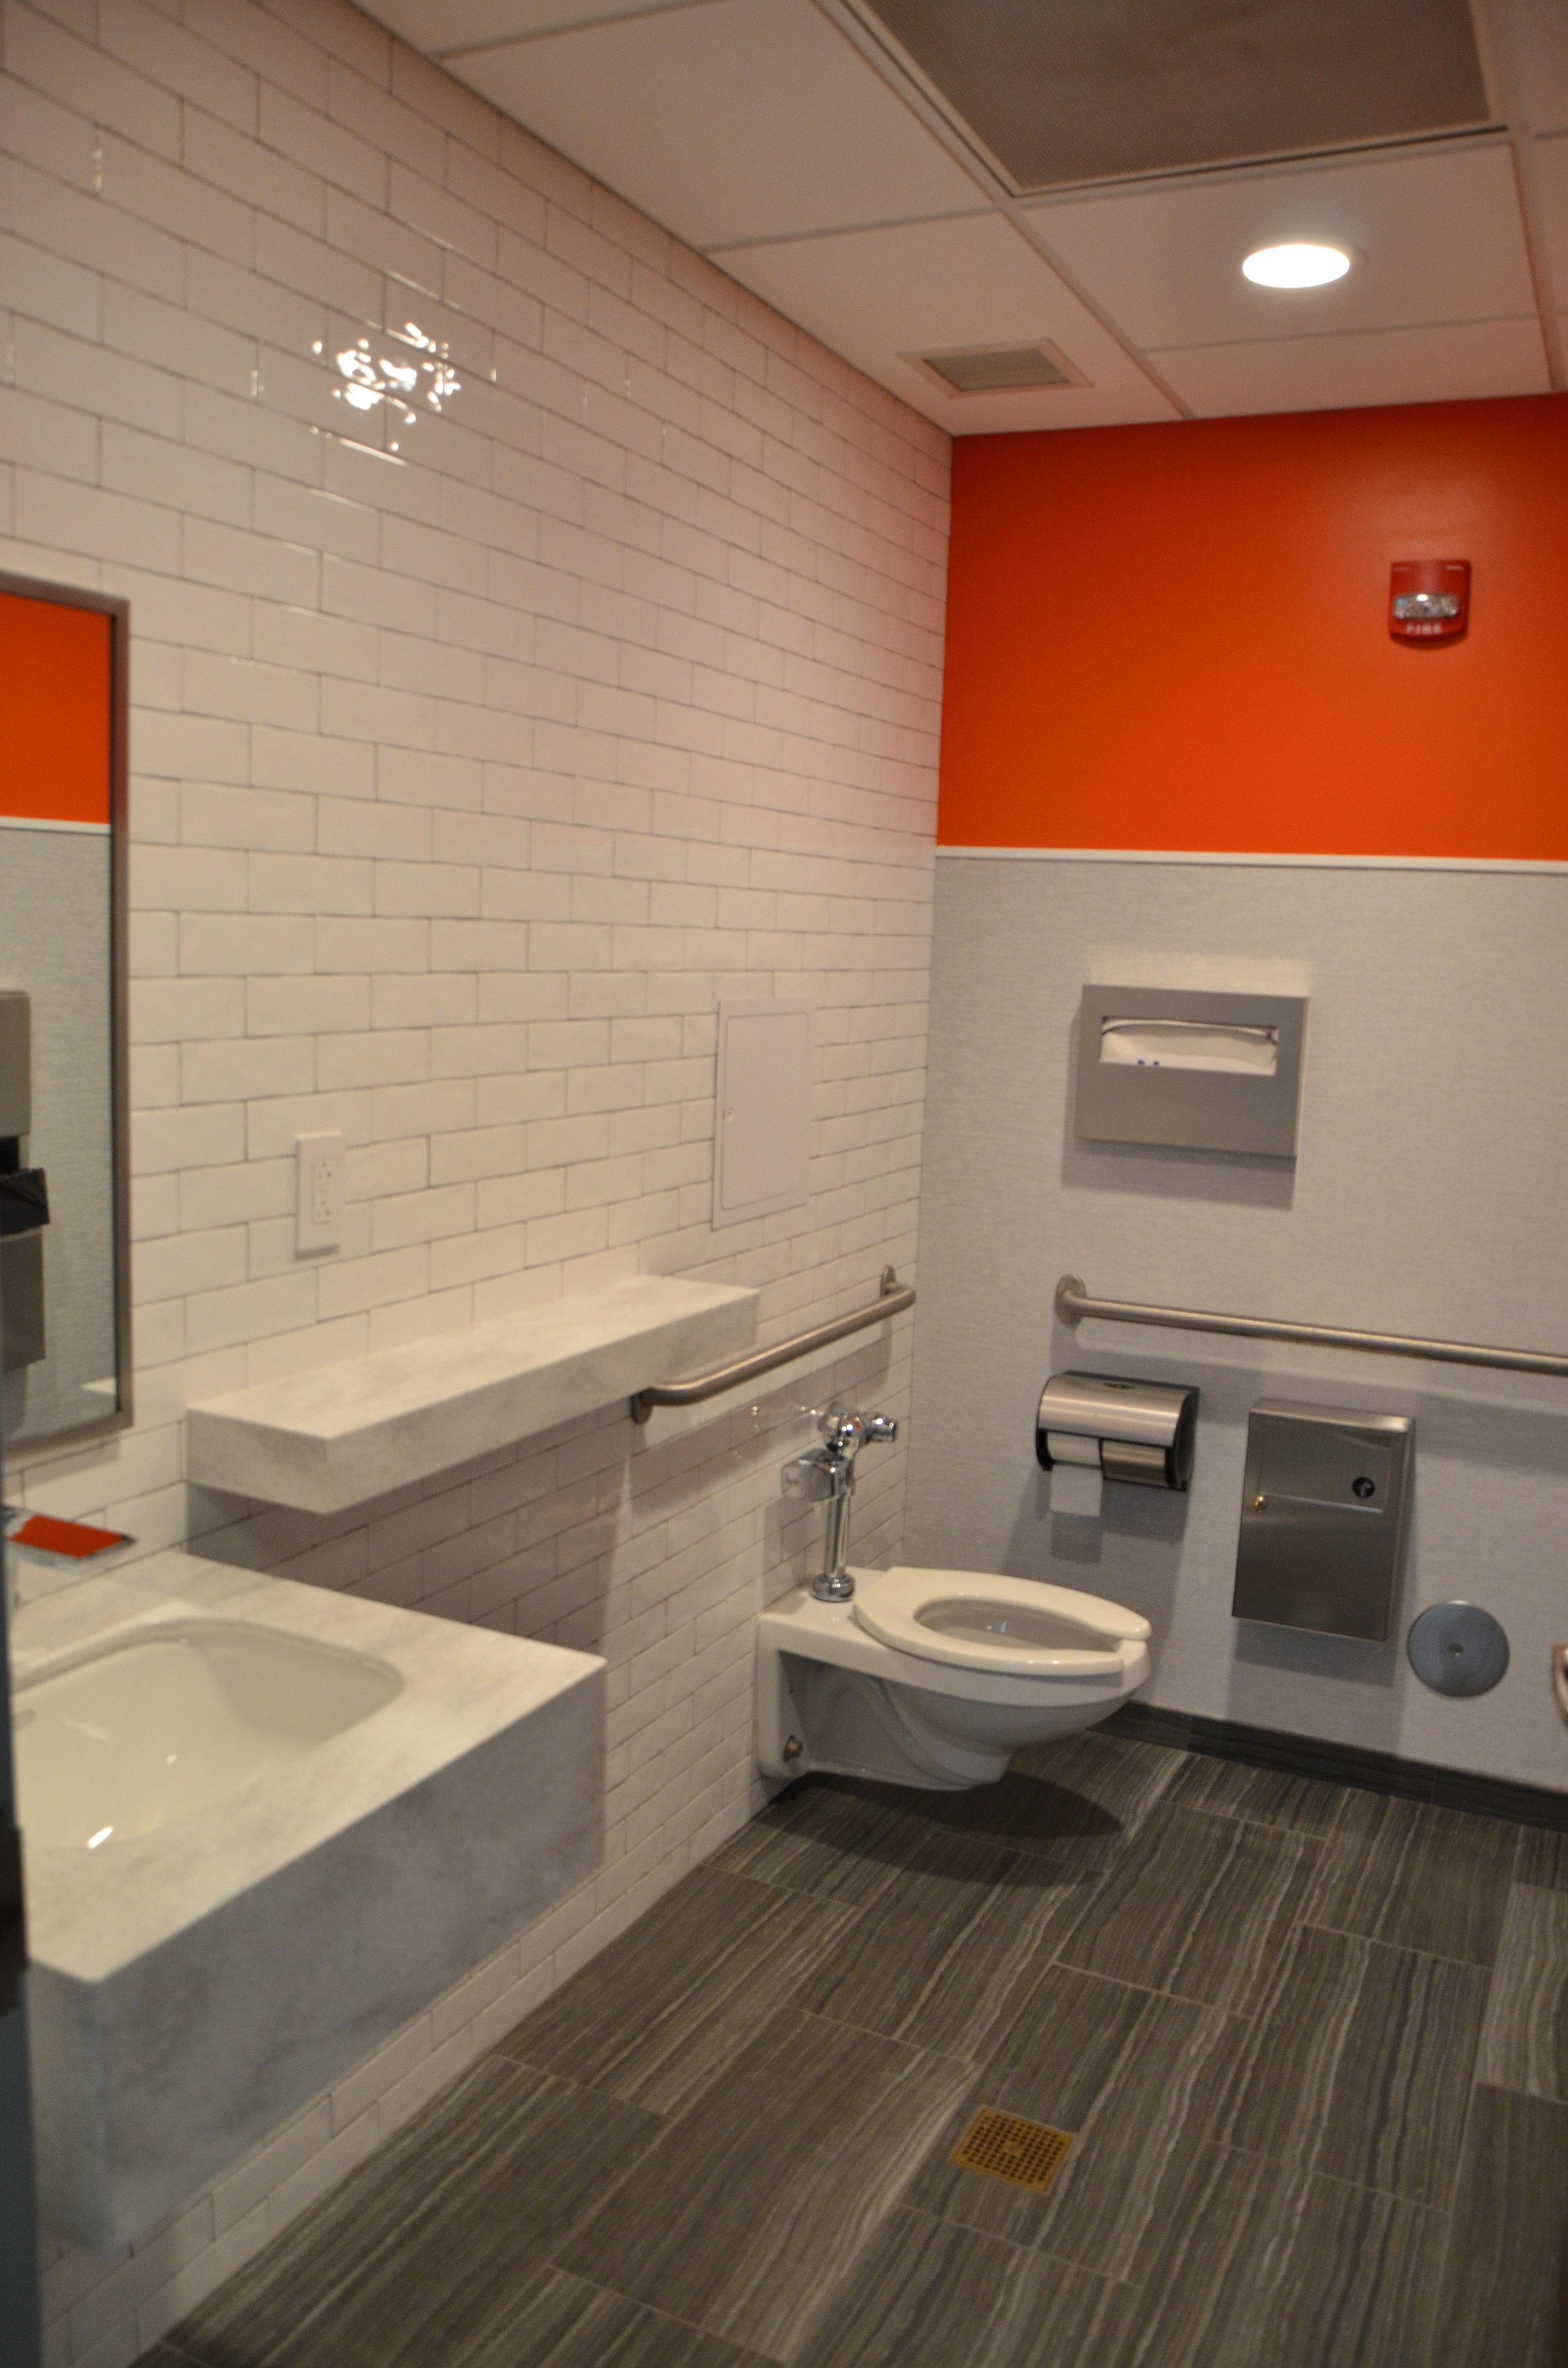 Corporate Bathroom Interior Design and Facility Design